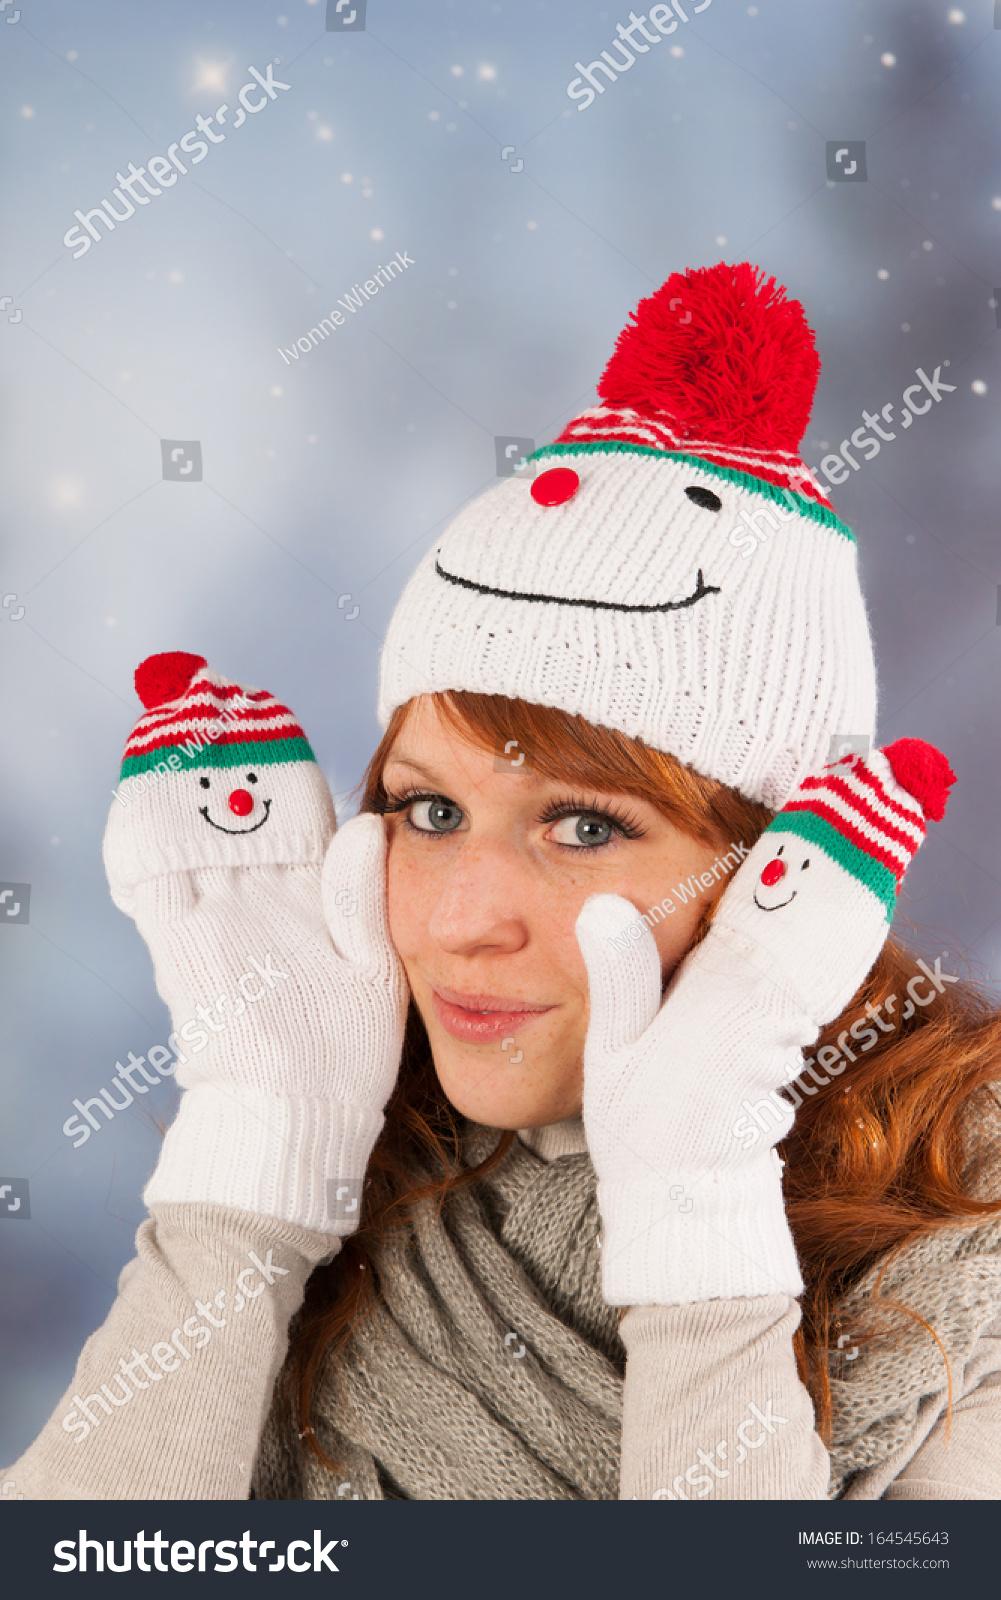 1096a4befb0ca Portrait Woman Winter Snow Snowman Hat Stock Photo (Edit Now ...